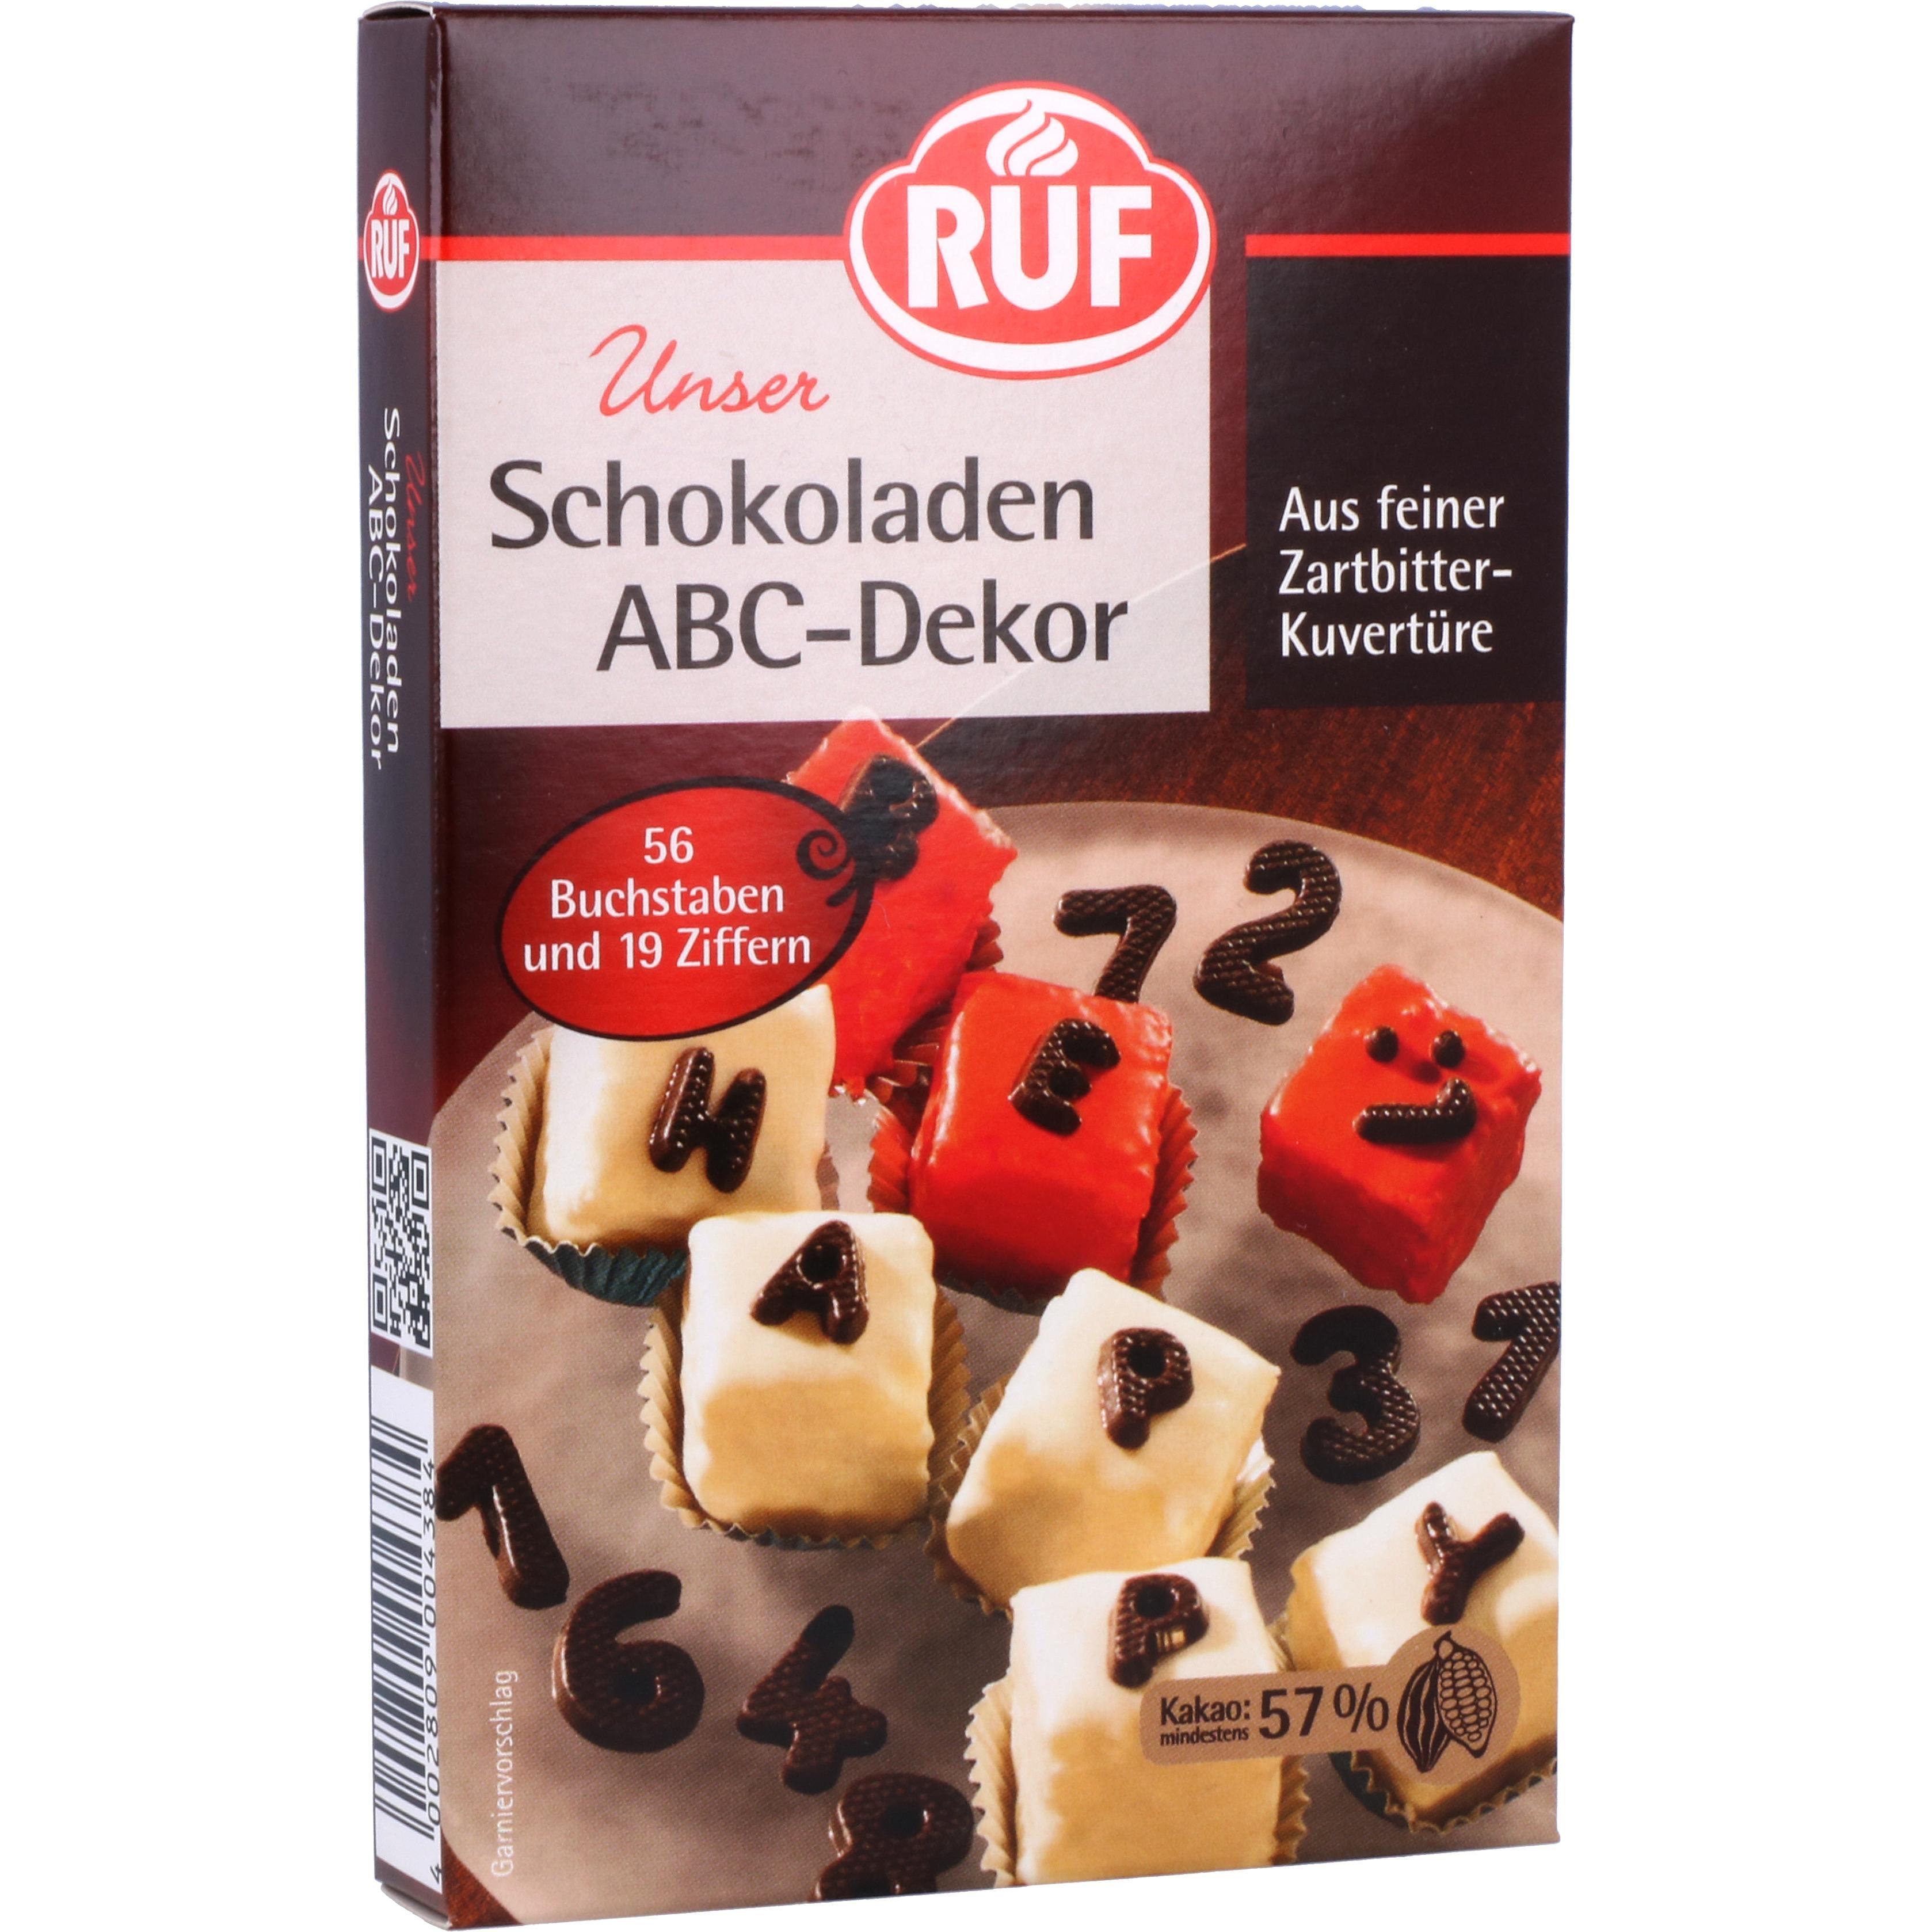 Ruf Schokoladen ABC-Dekor 48g